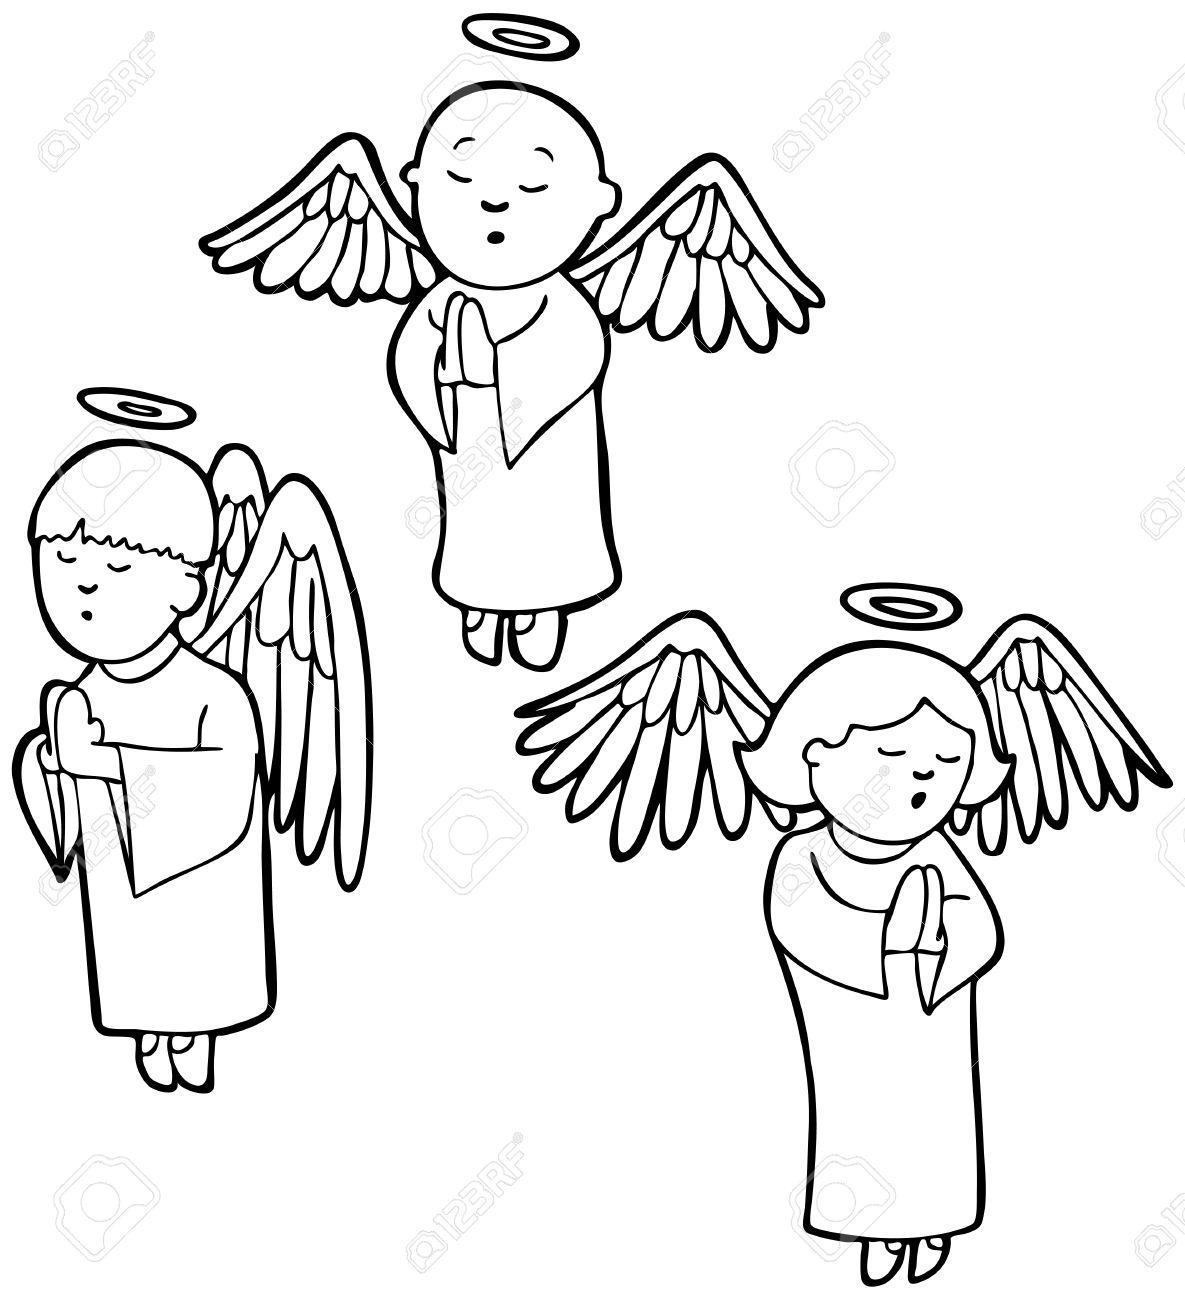 1185x1300 Praying Angels Line Art Three Angels Praying In A Cartoon Style